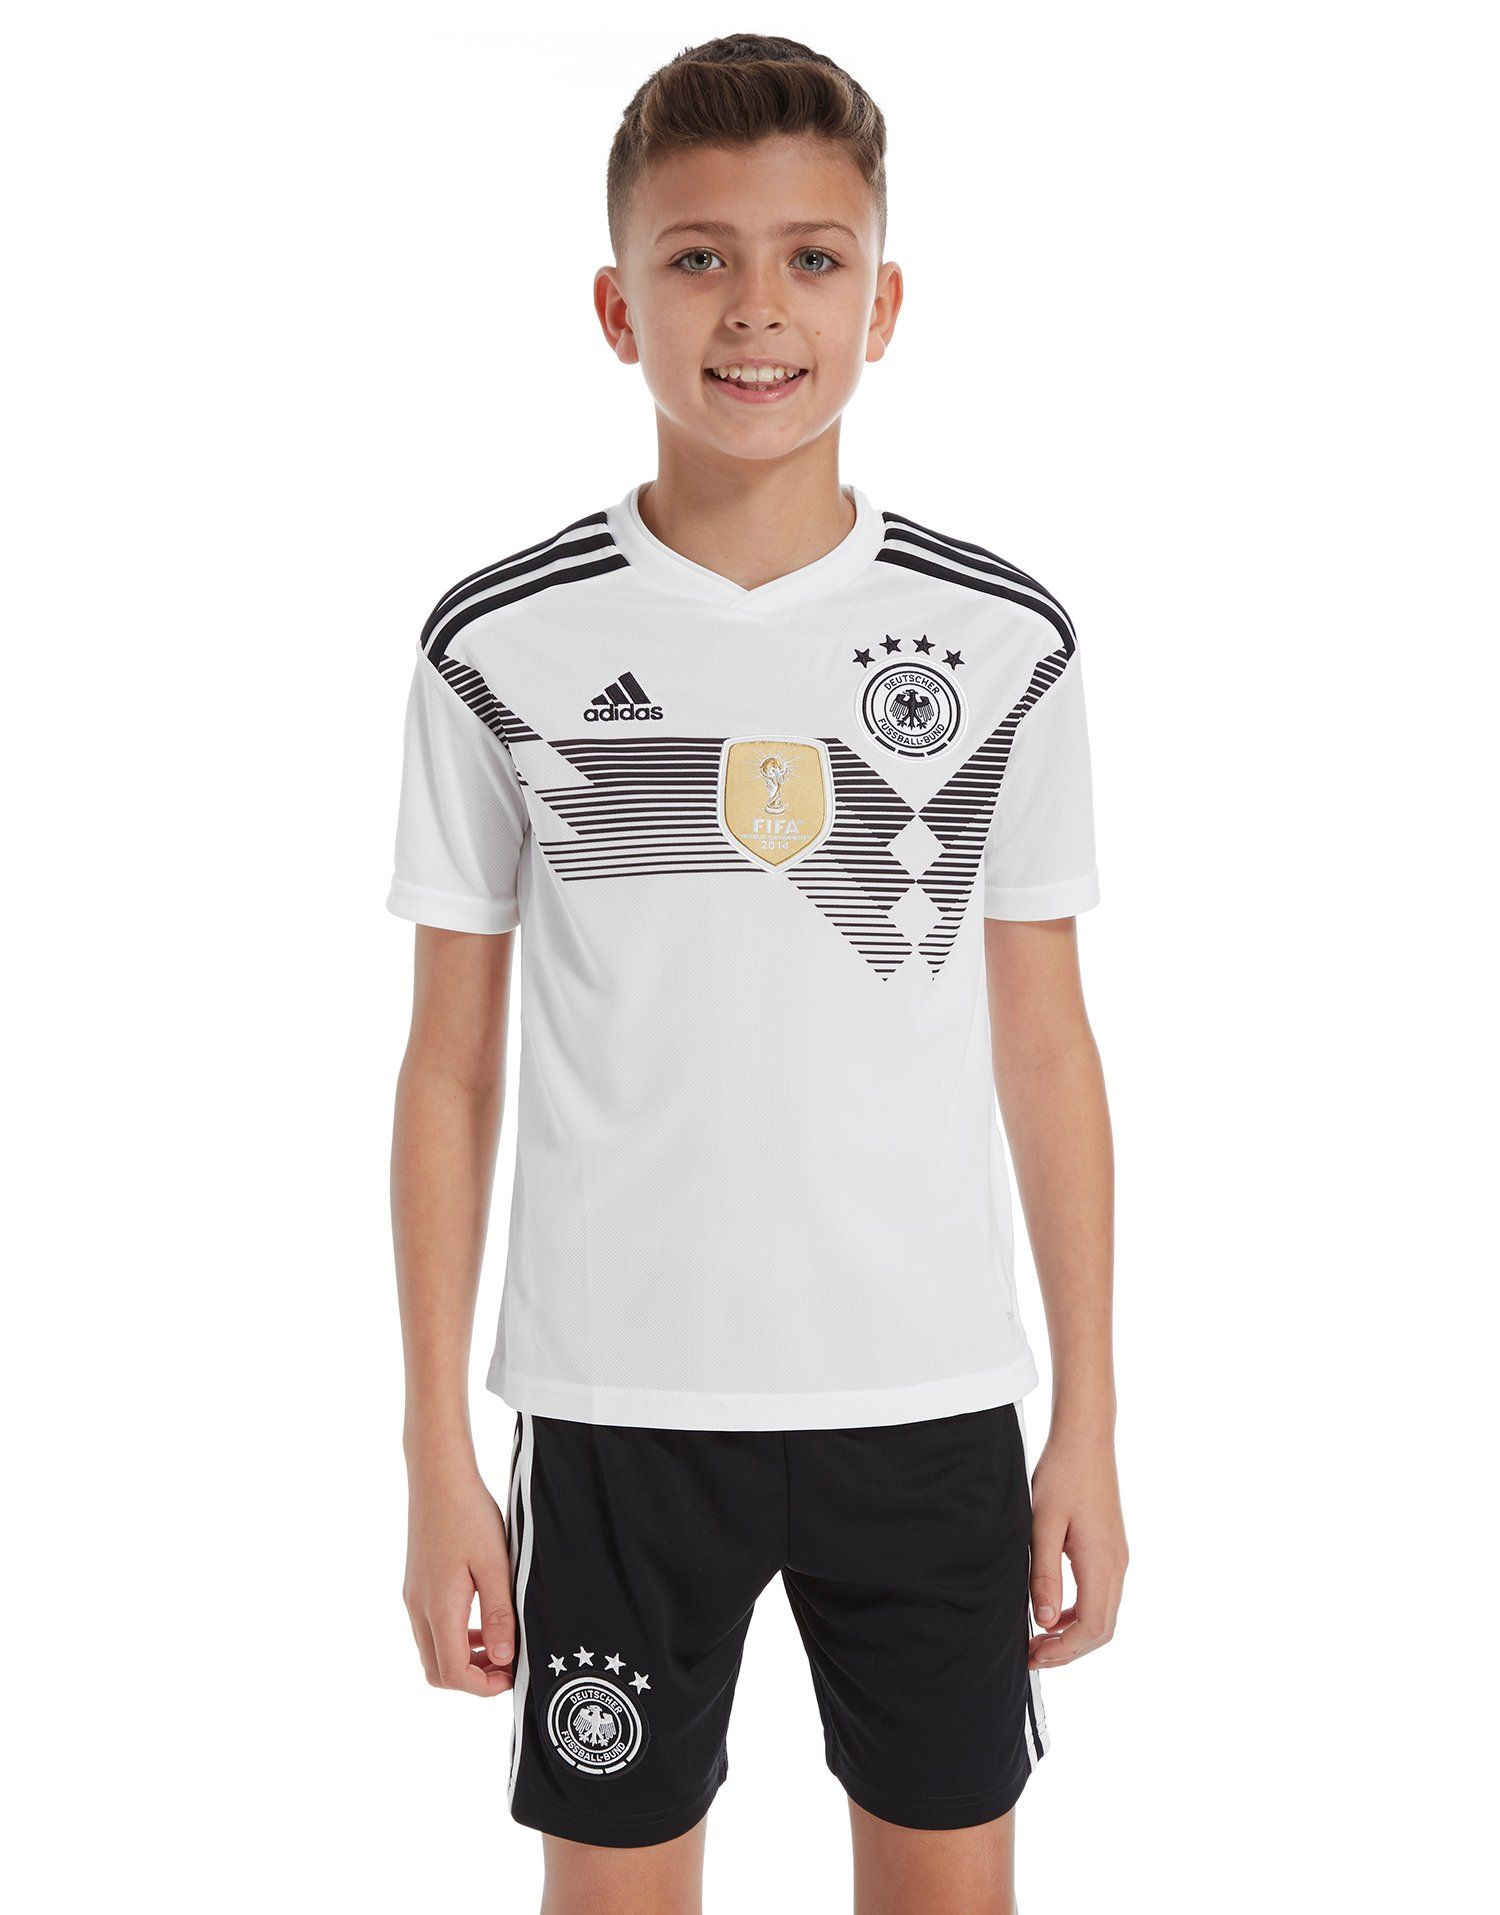 Germany Football Shirts & Kit